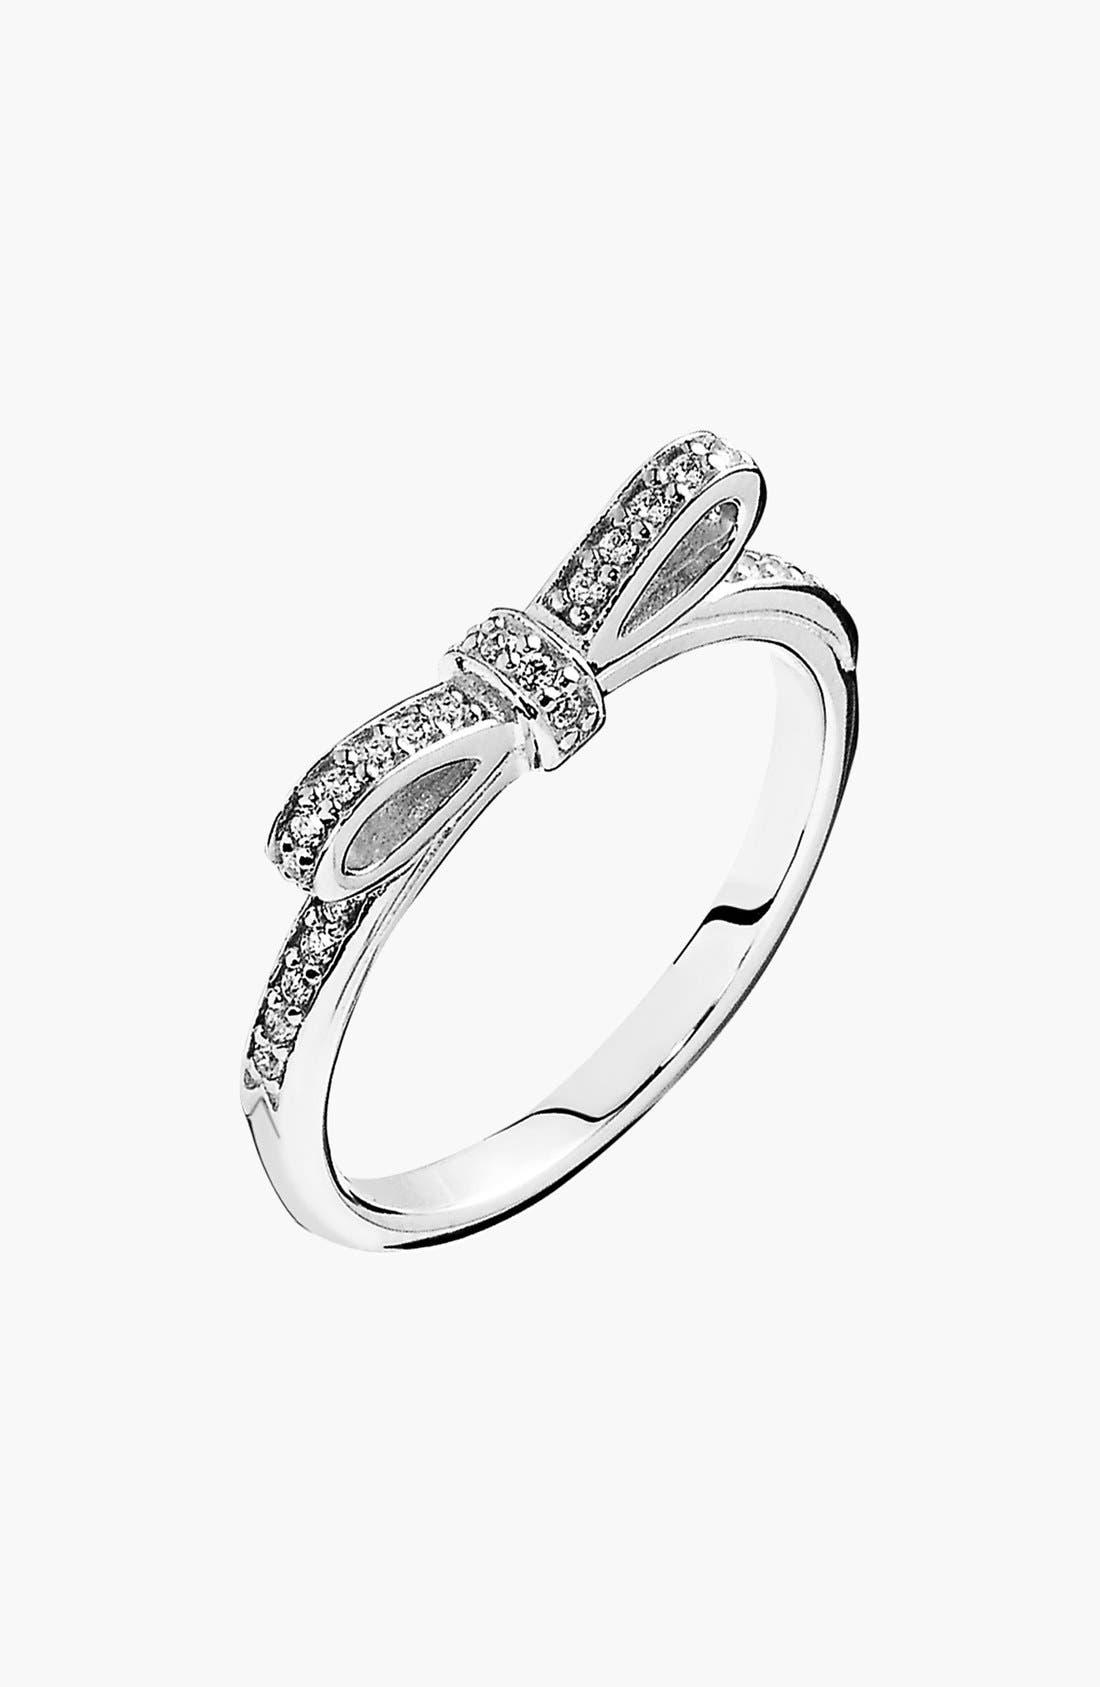 Main Image - PANDORA 'Sparkling Bow' Ring